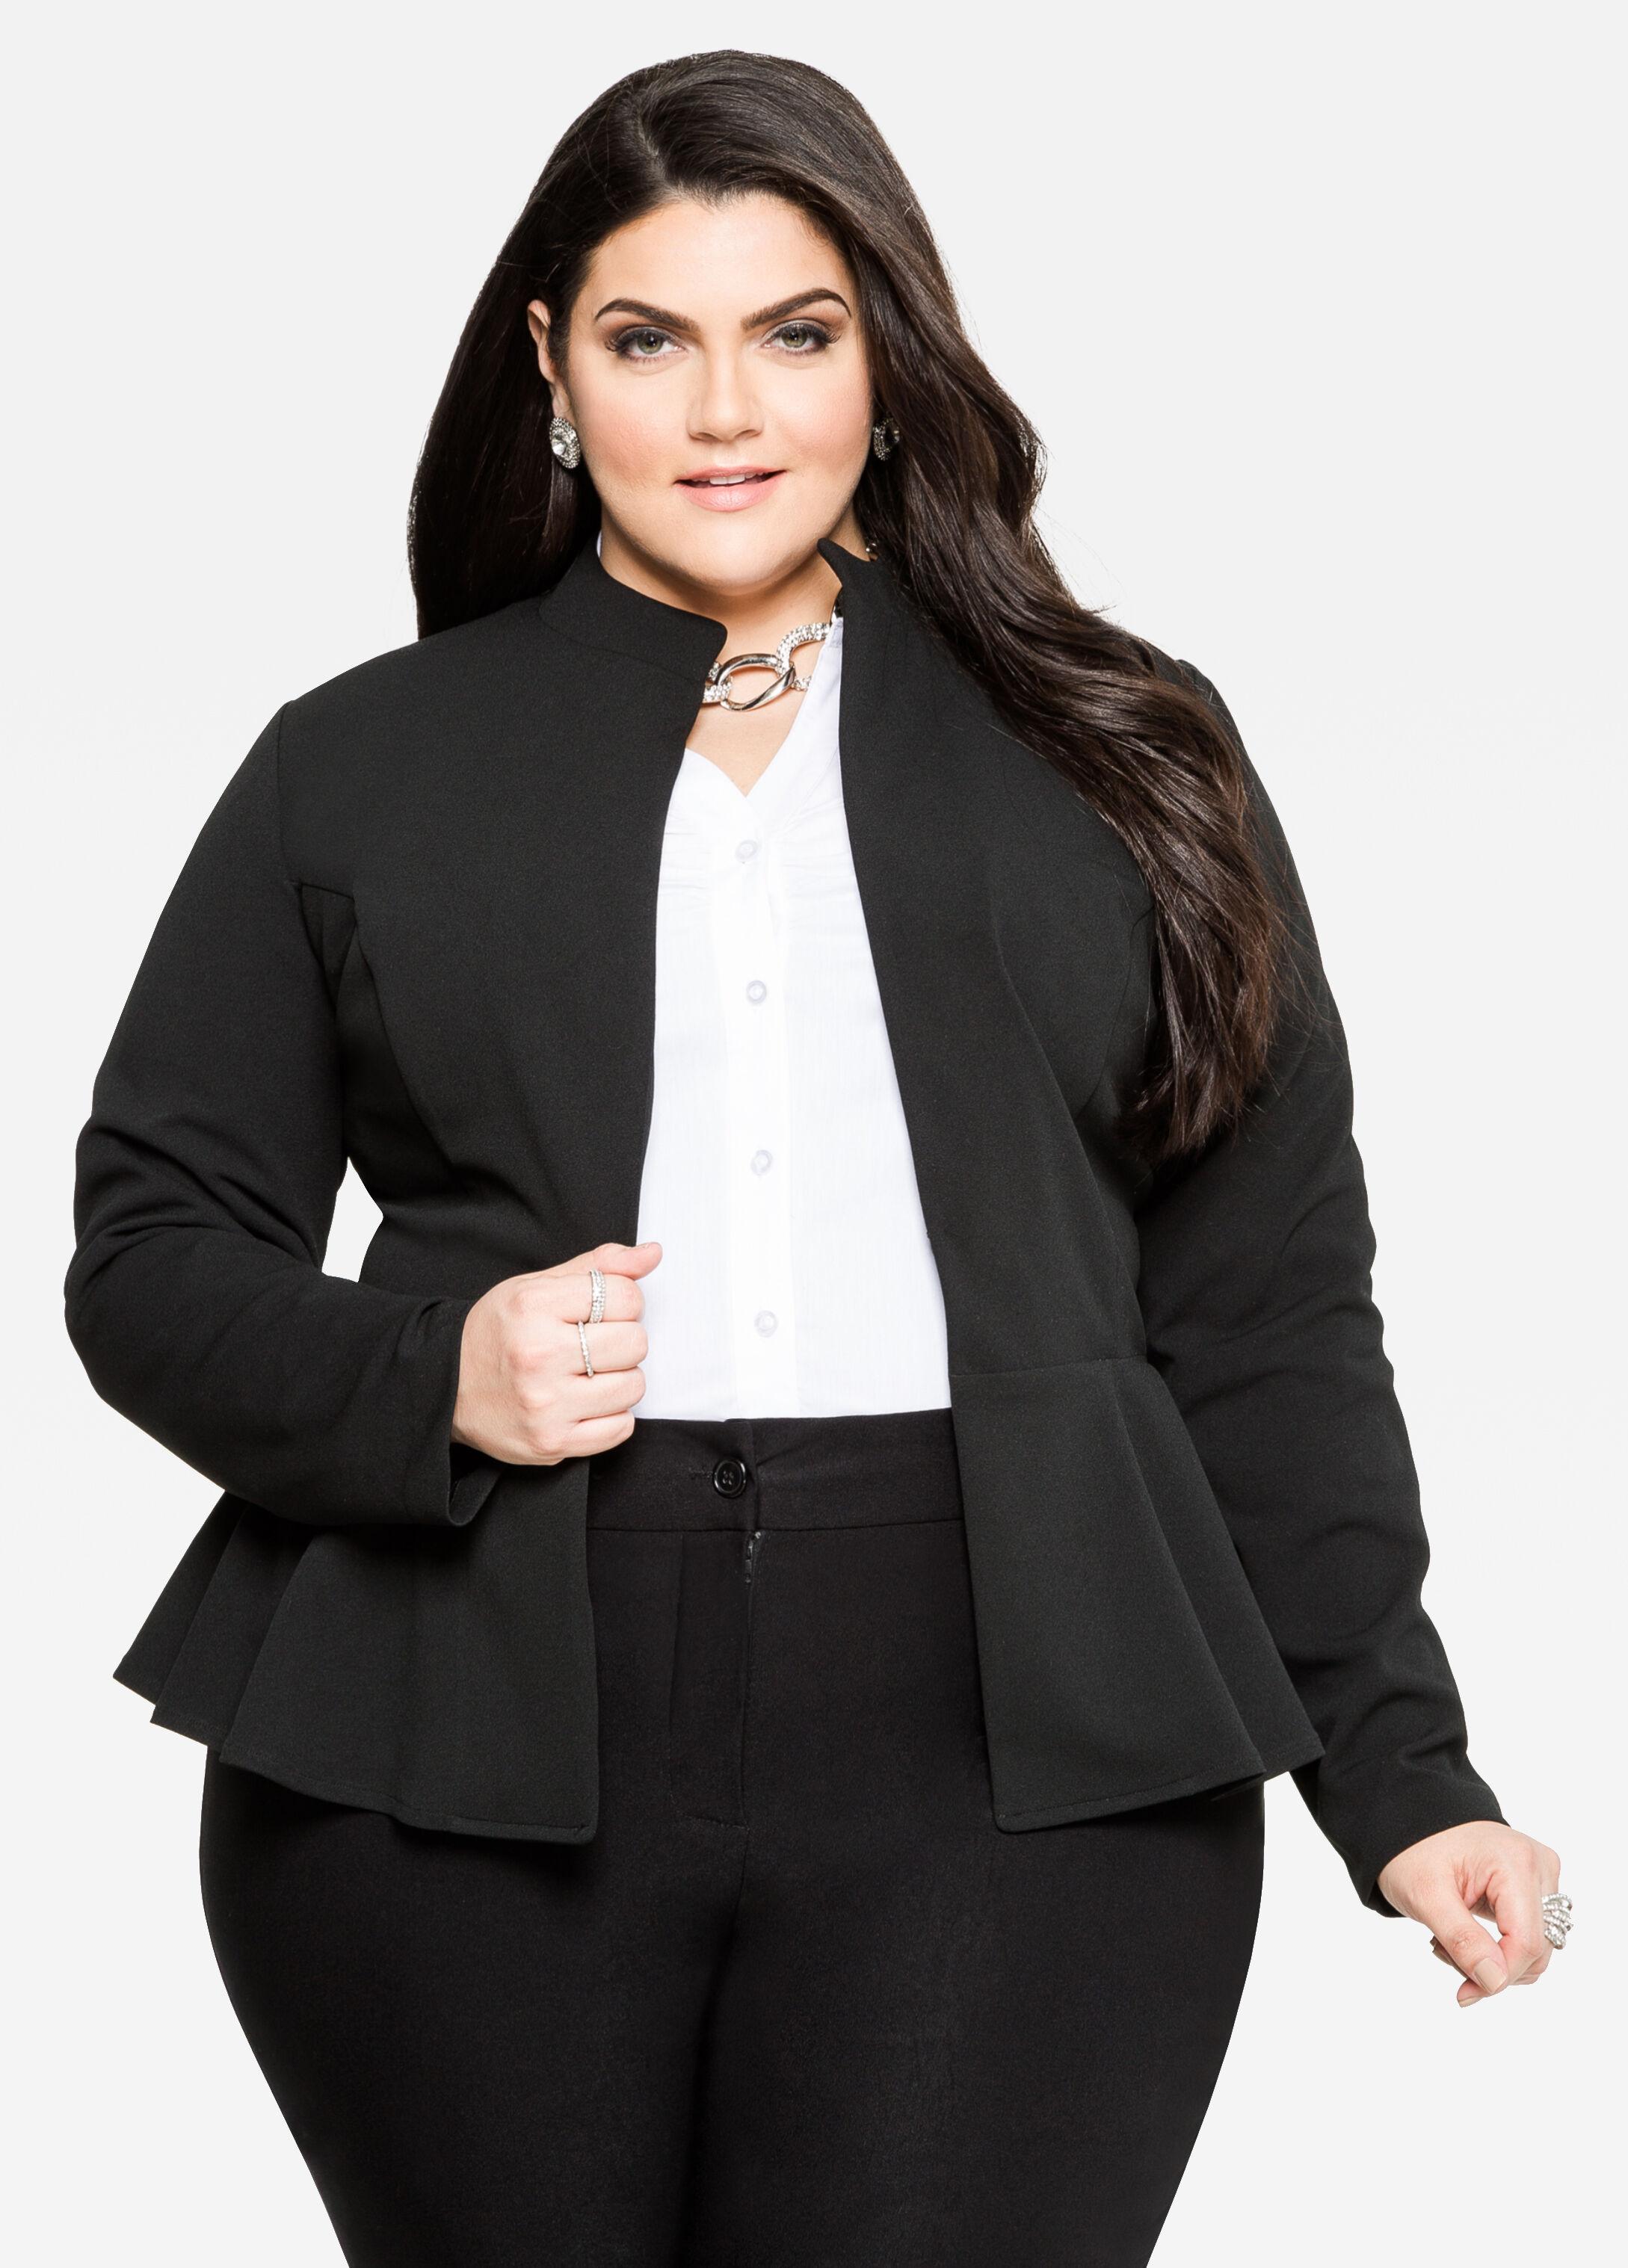 Buy Peplum Jackets for Women Plus Size - Ashley Stewart